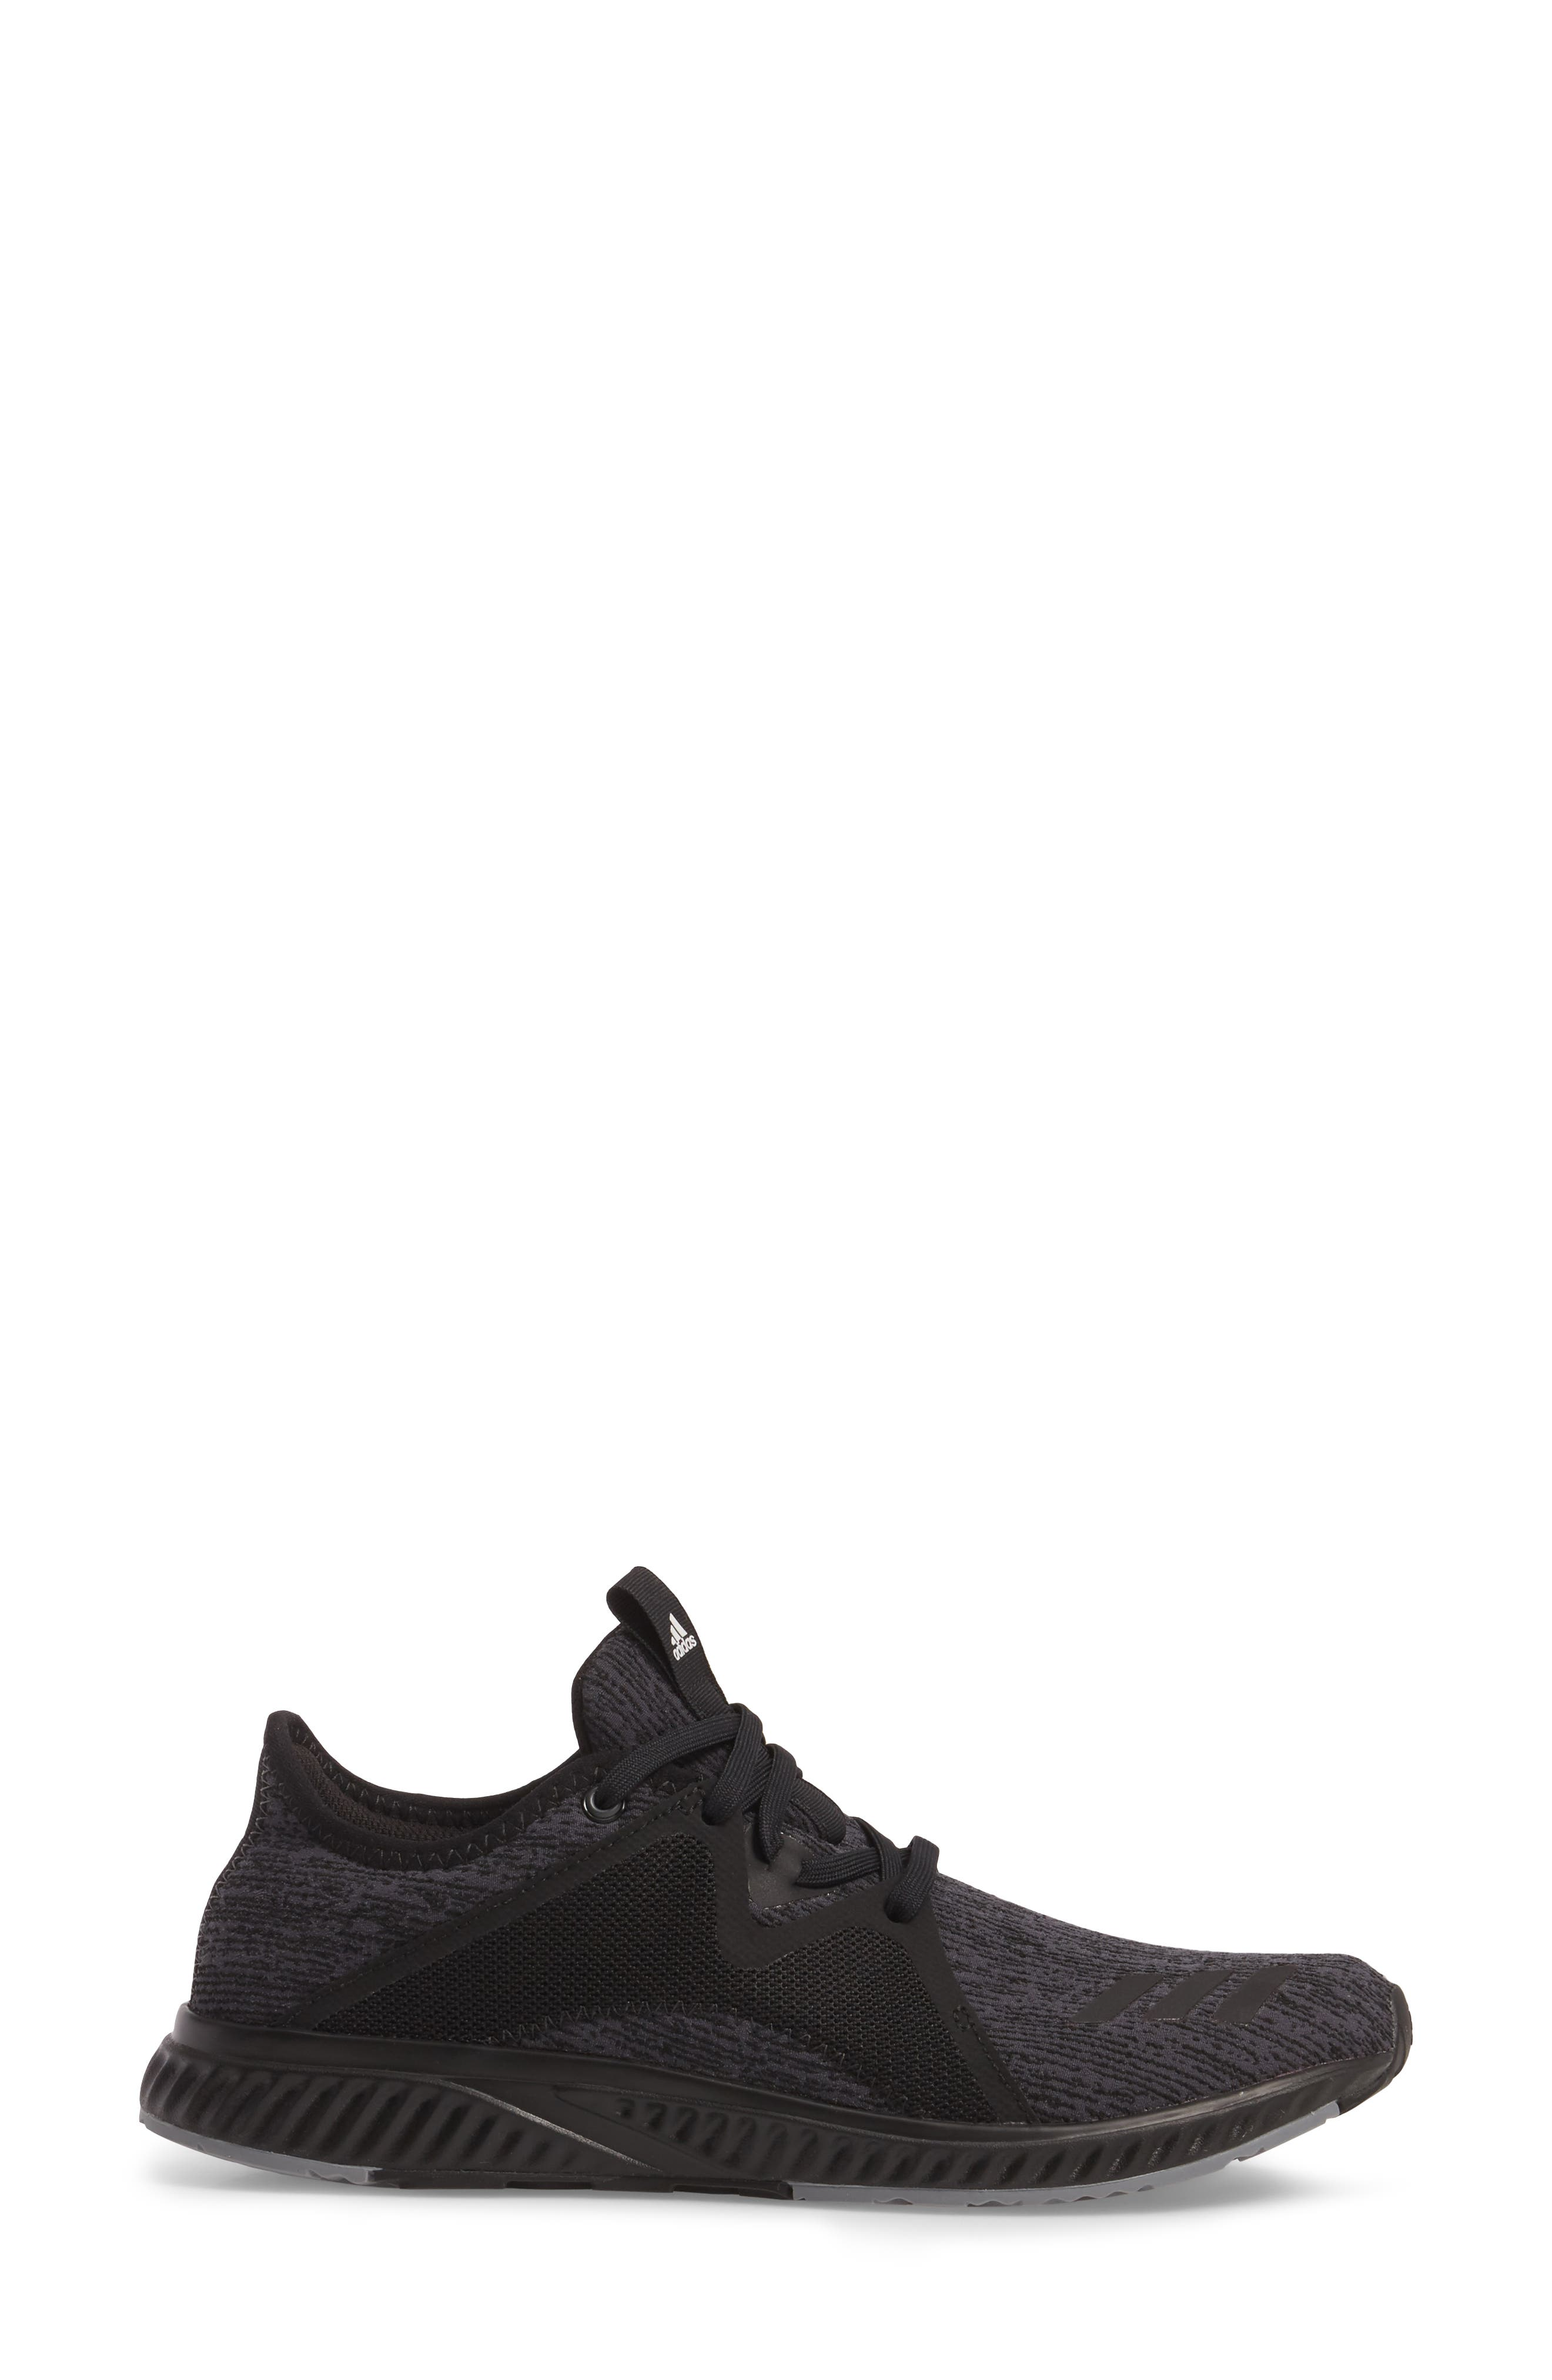 Alternate Image 3  - adidas Edge Lux 2.0 Running Shoe (Women)